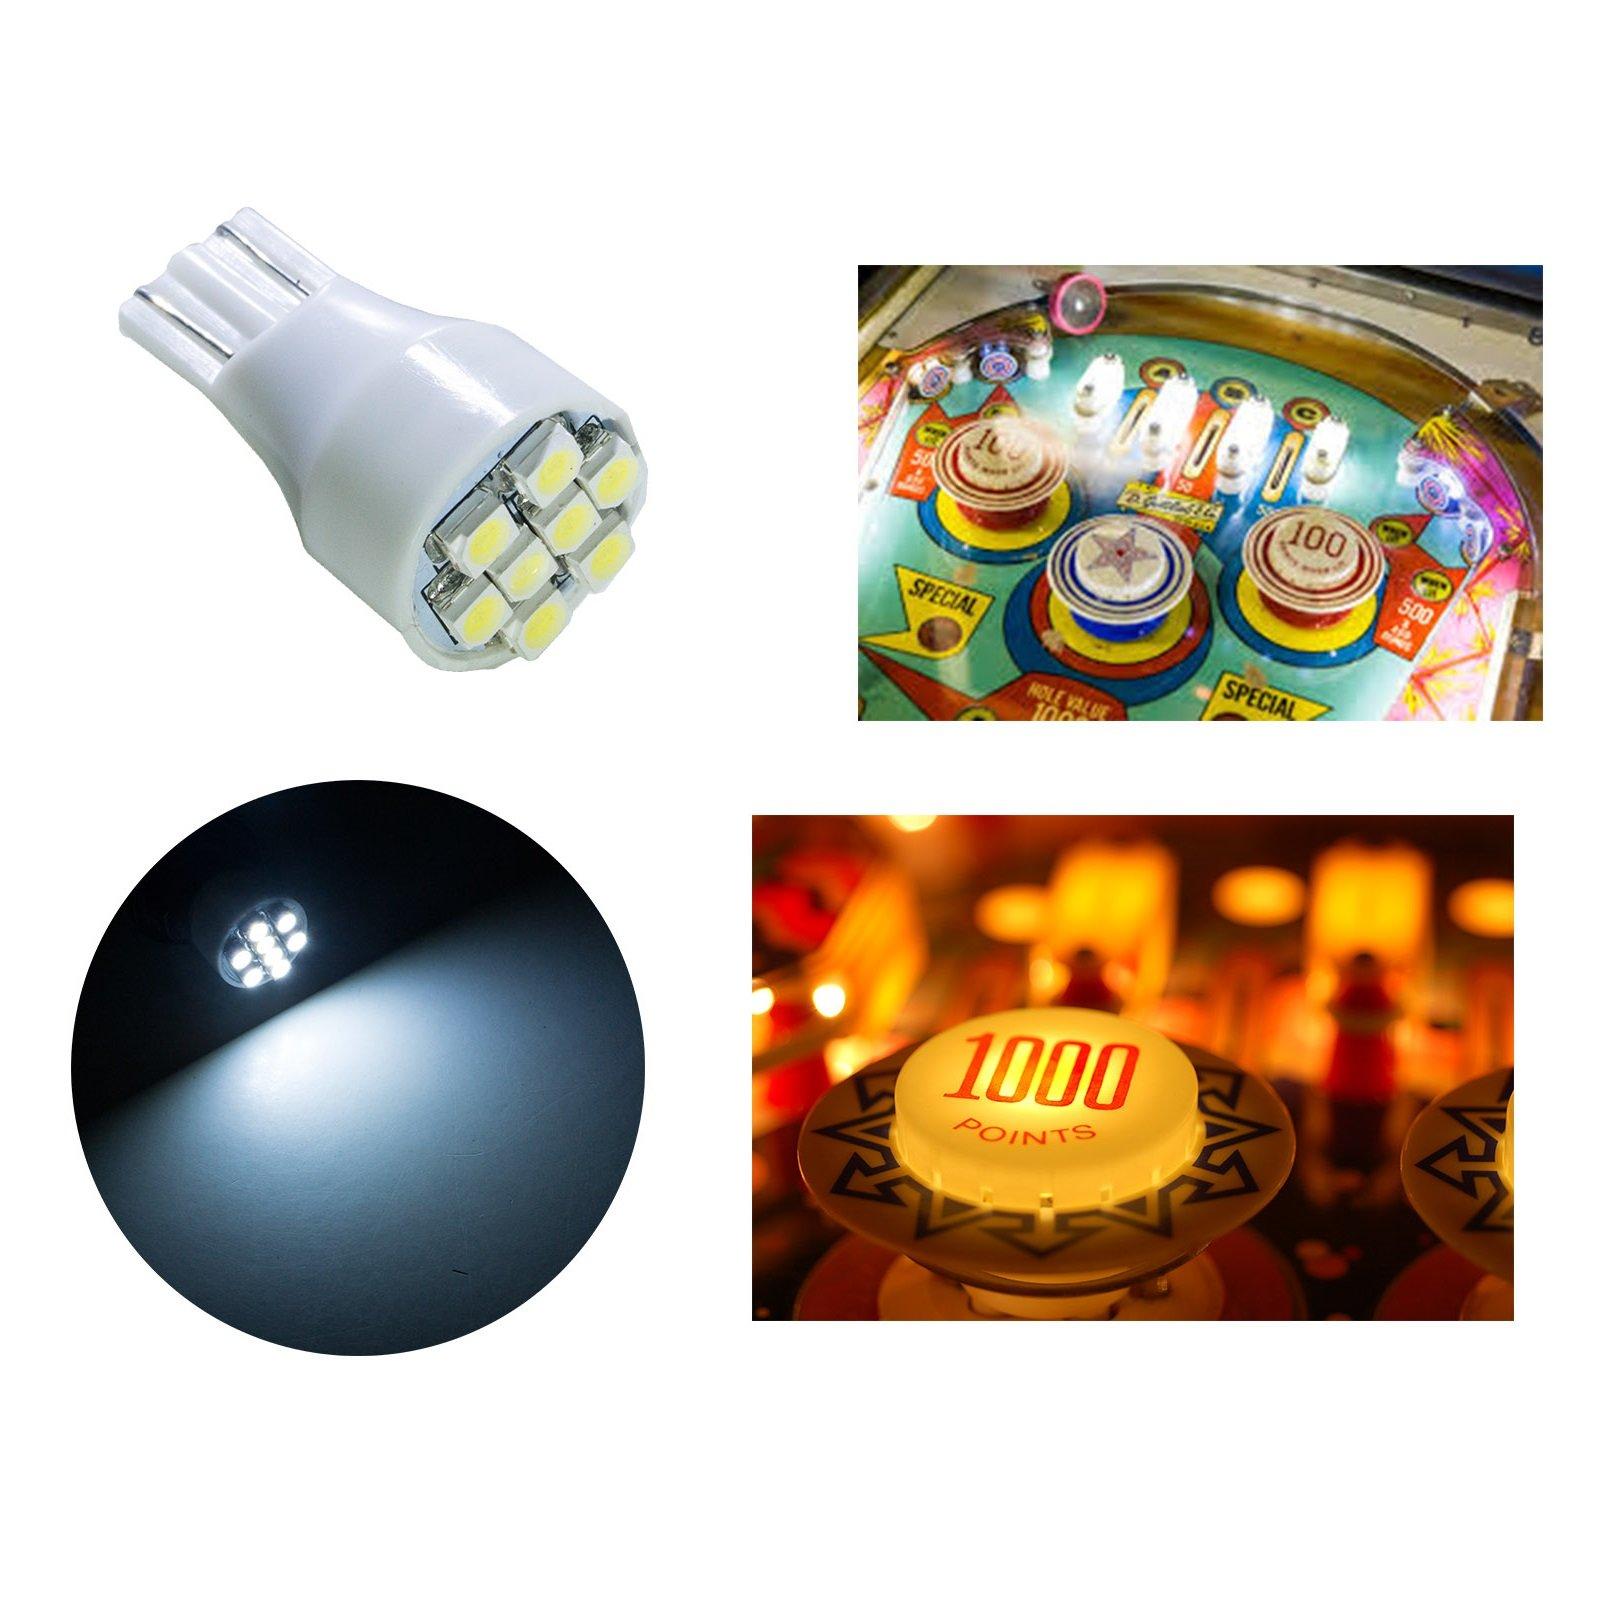 PA 10x T15 #906 921 912 Flasher Strobe no Ghosting 3528 SMD 8 LED Pinball Game Machine Light Bulb White-12V(10pcs) by PA